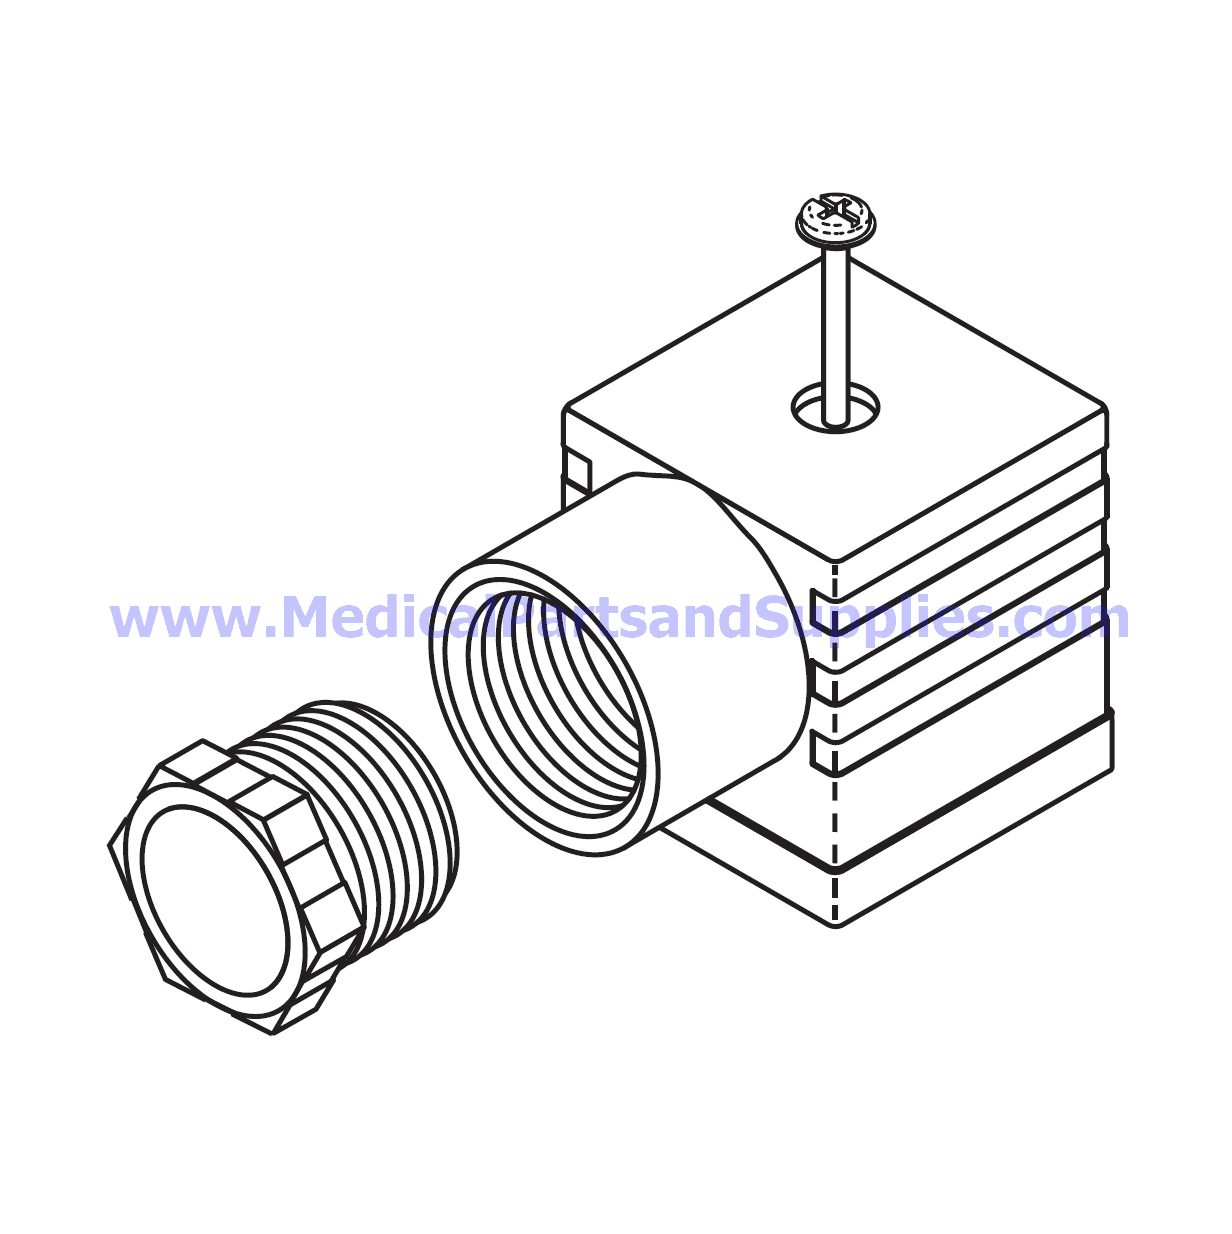 Audio Connector Wiring Diagram